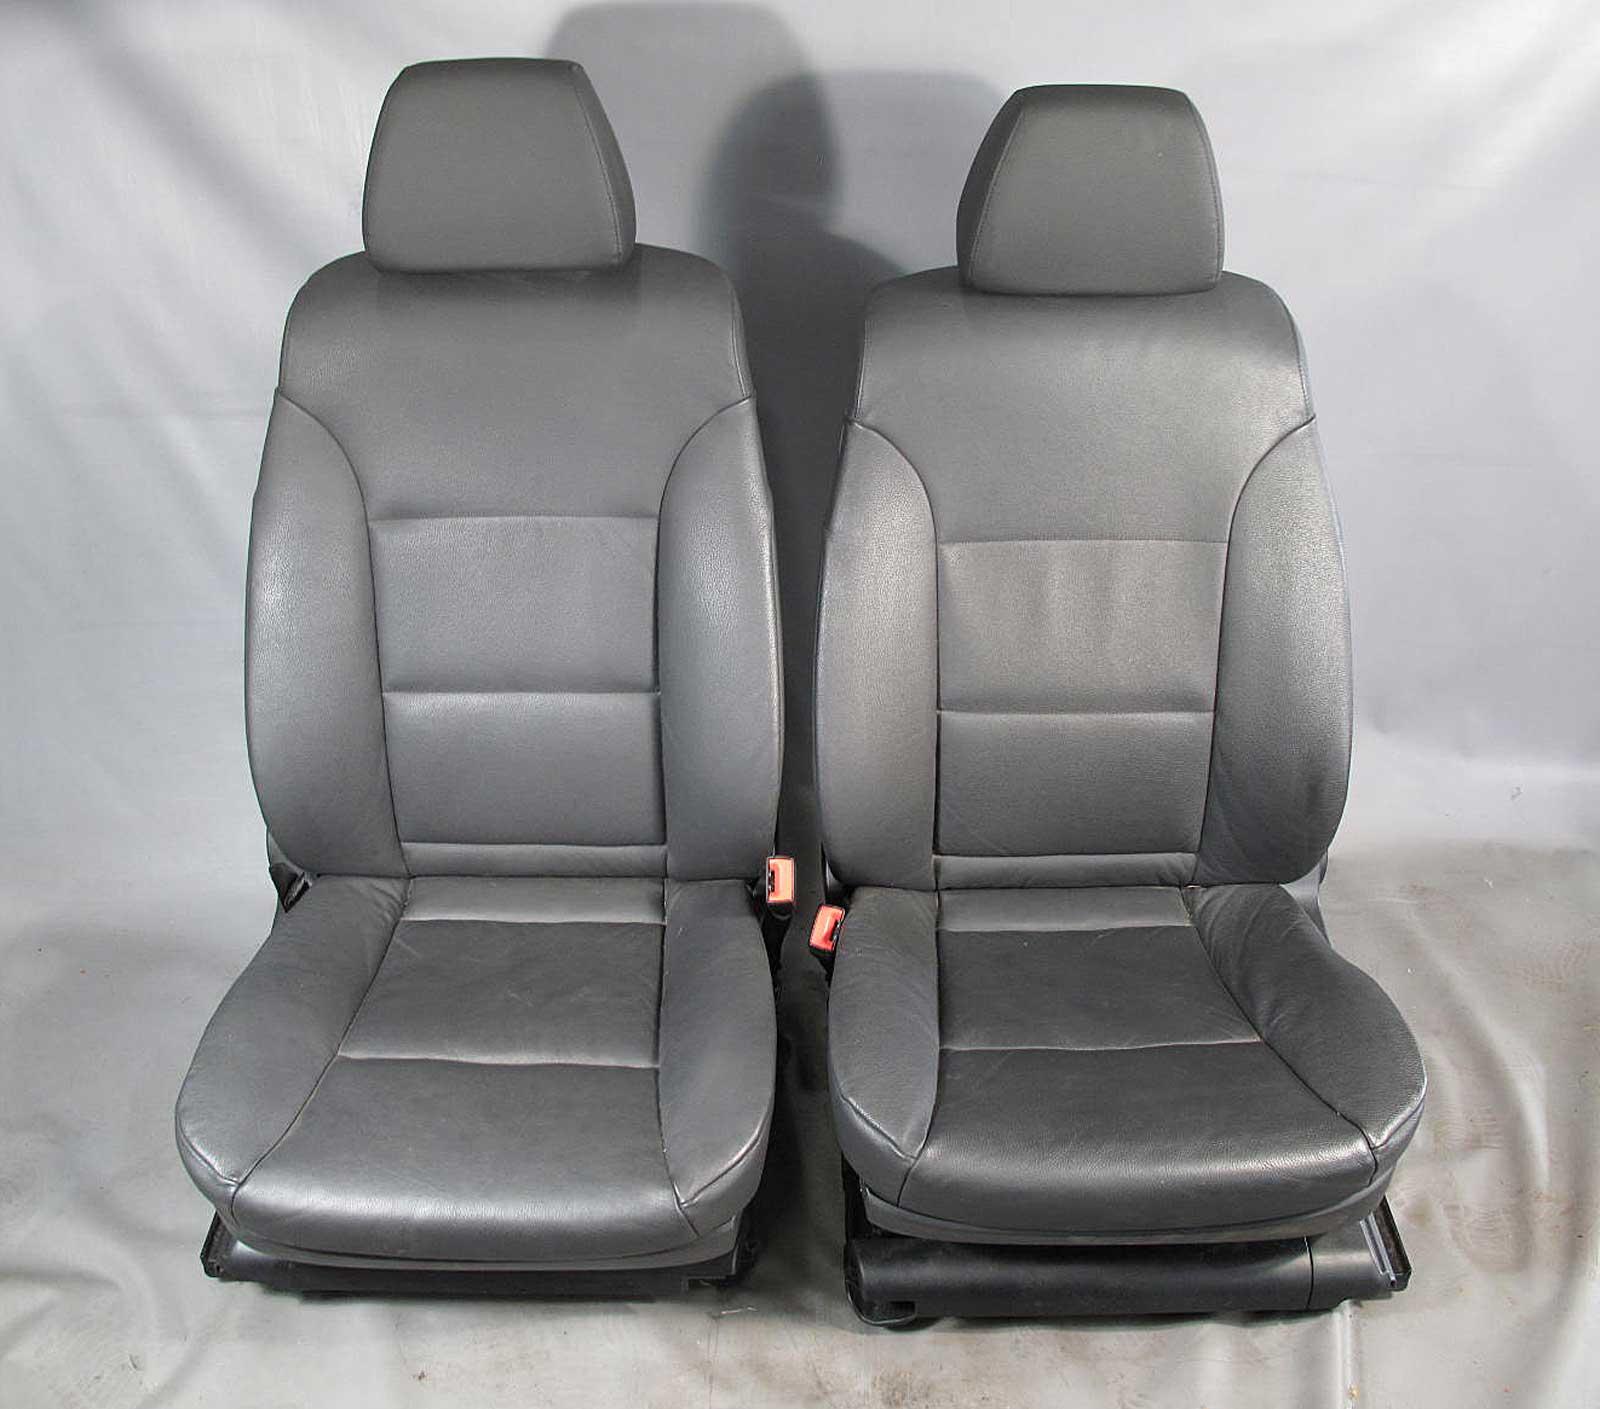 BMW E60 5 Series Front Seats Pair Left Right Black Leather Power Mem